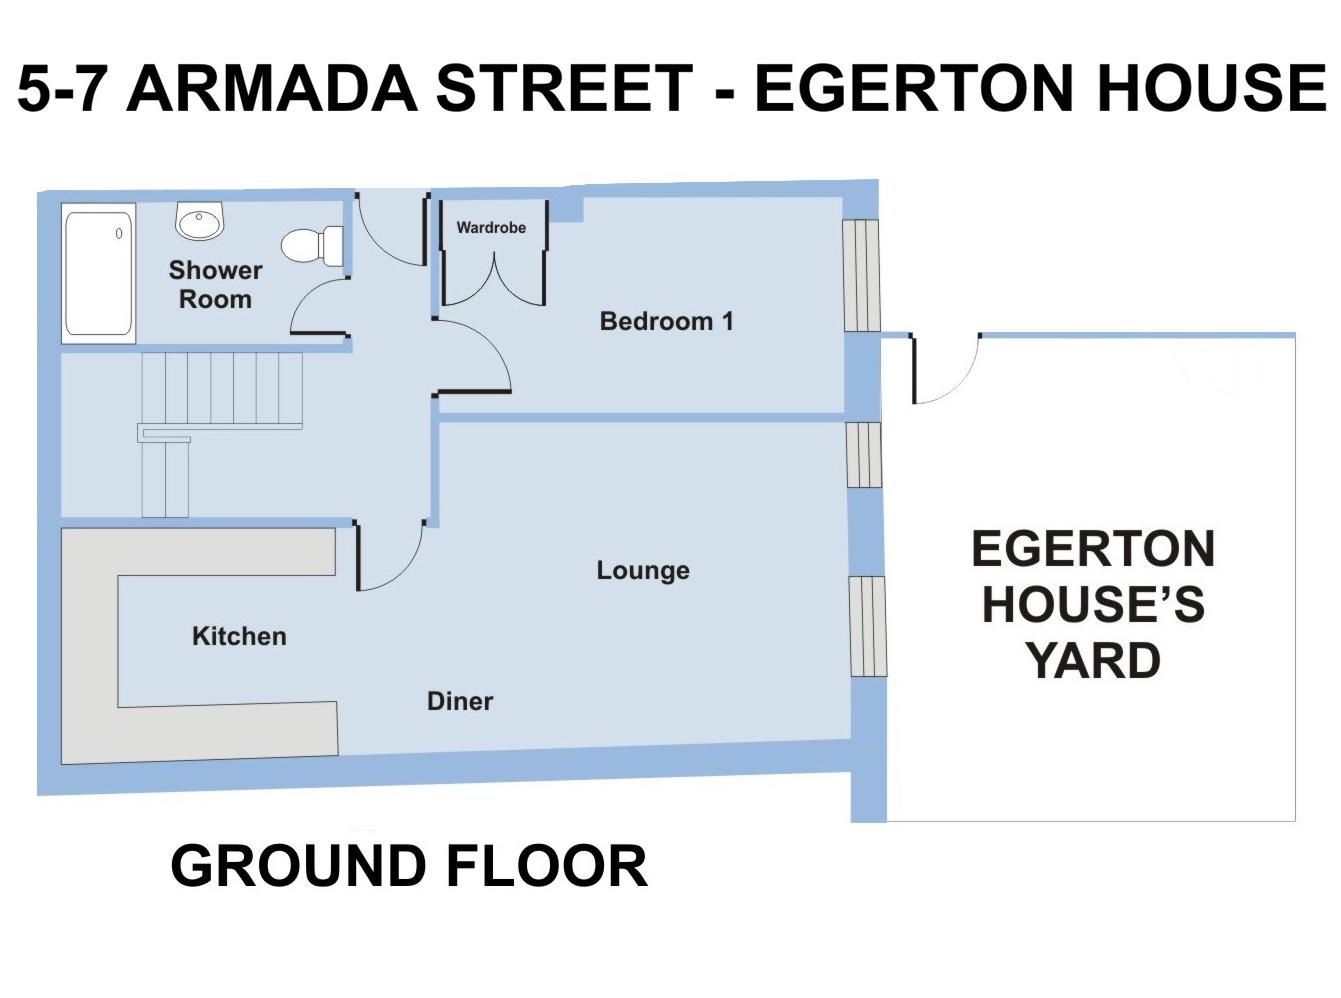 Egerton House, 5-7 Armada Street - 6 bedroom student accommodation Plymouth - Floor plan